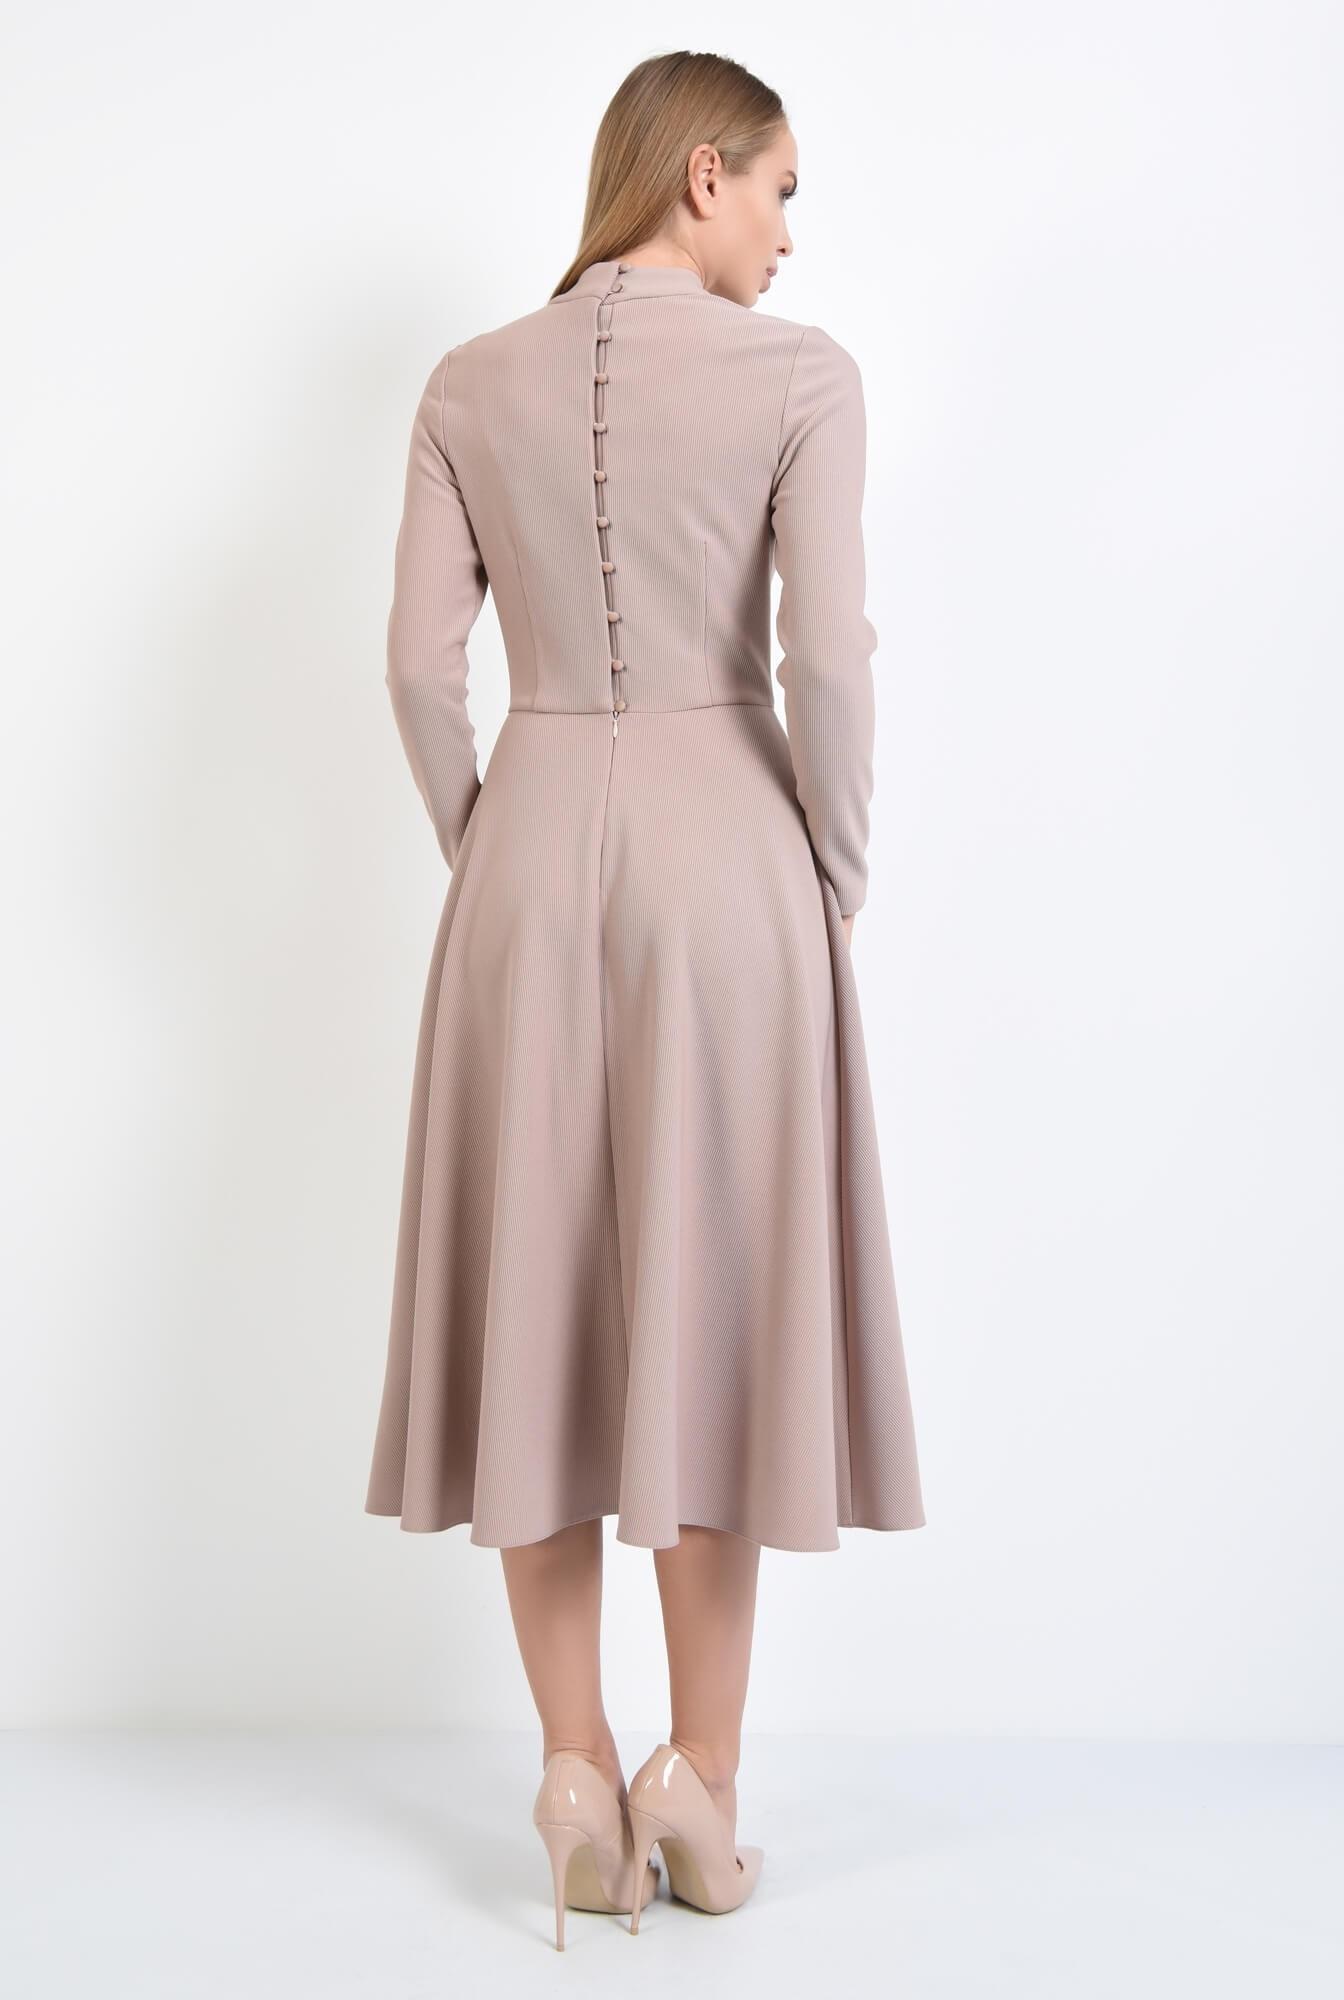 1 - rochie evazata, cu guler inalt, nasturi perla la spate, roz